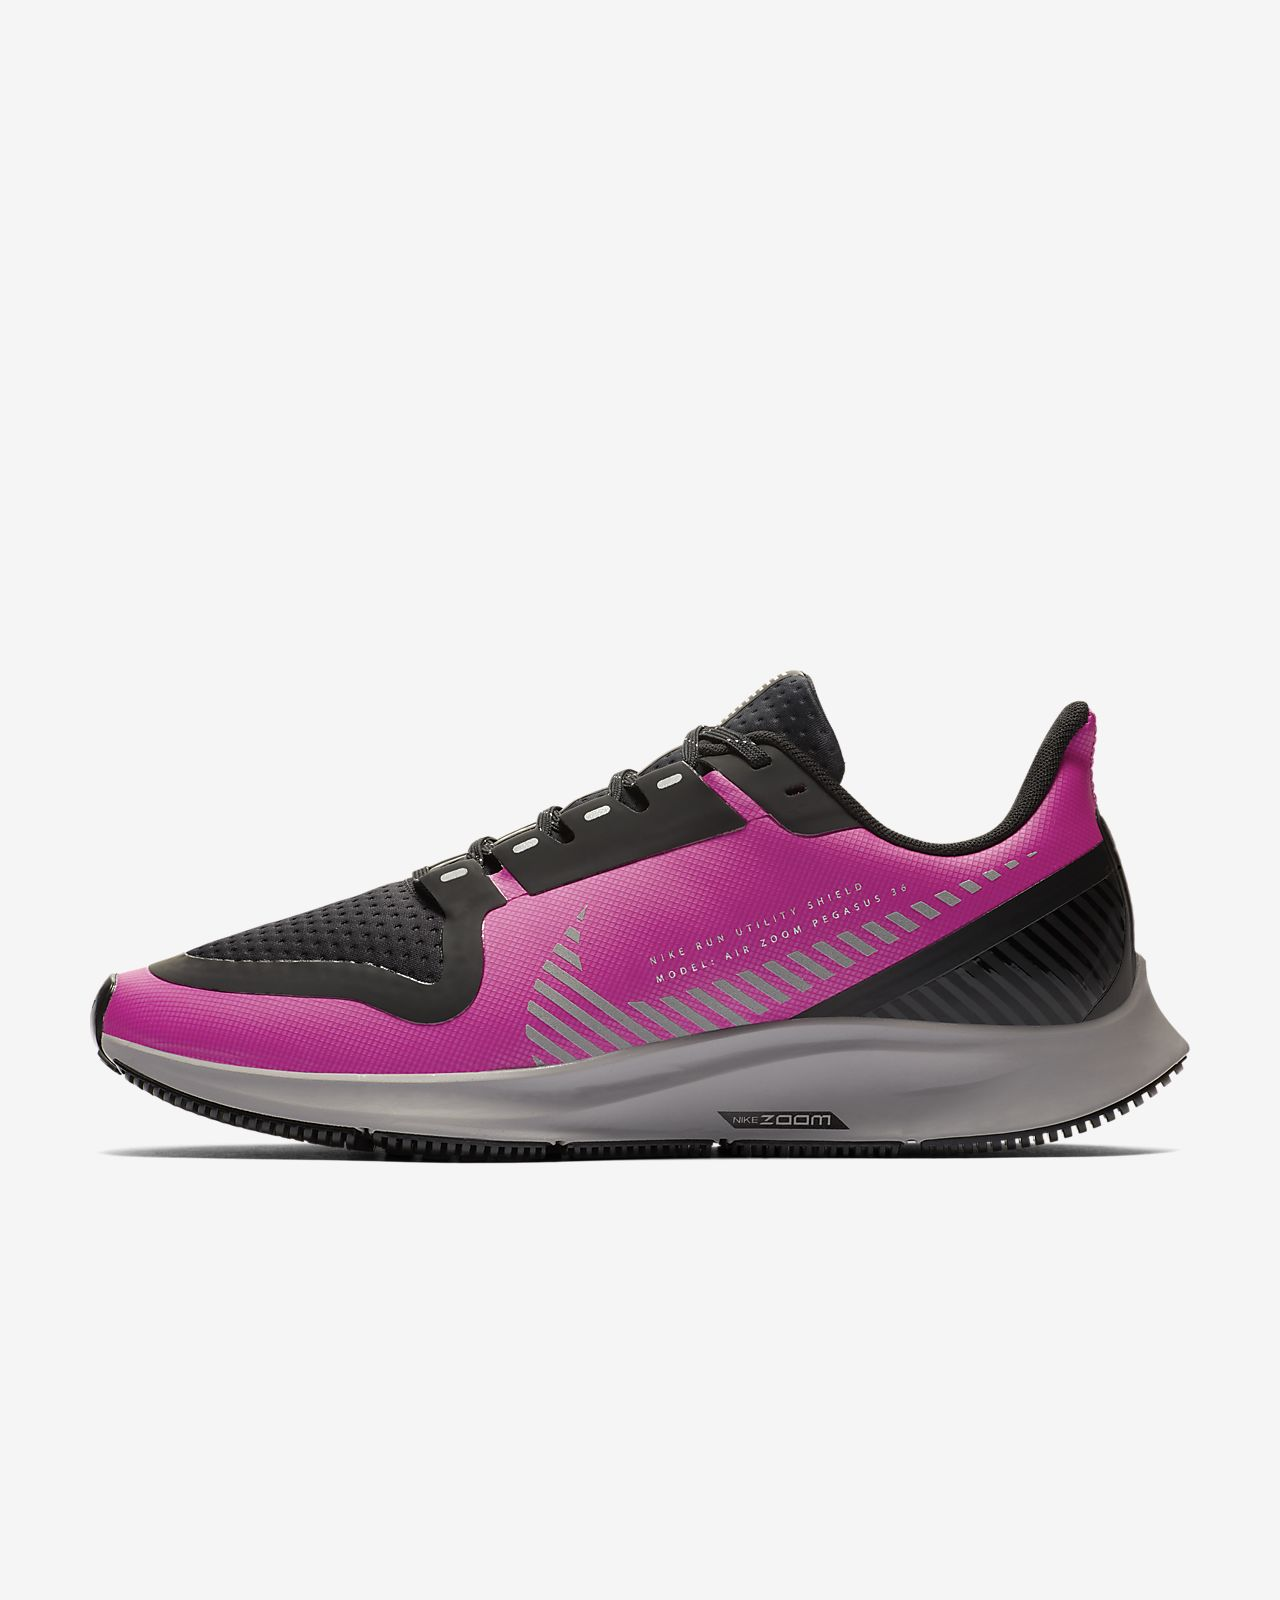 Sapatilhas de running Nike Air Zoom Pegasus 36 Shield para mulher